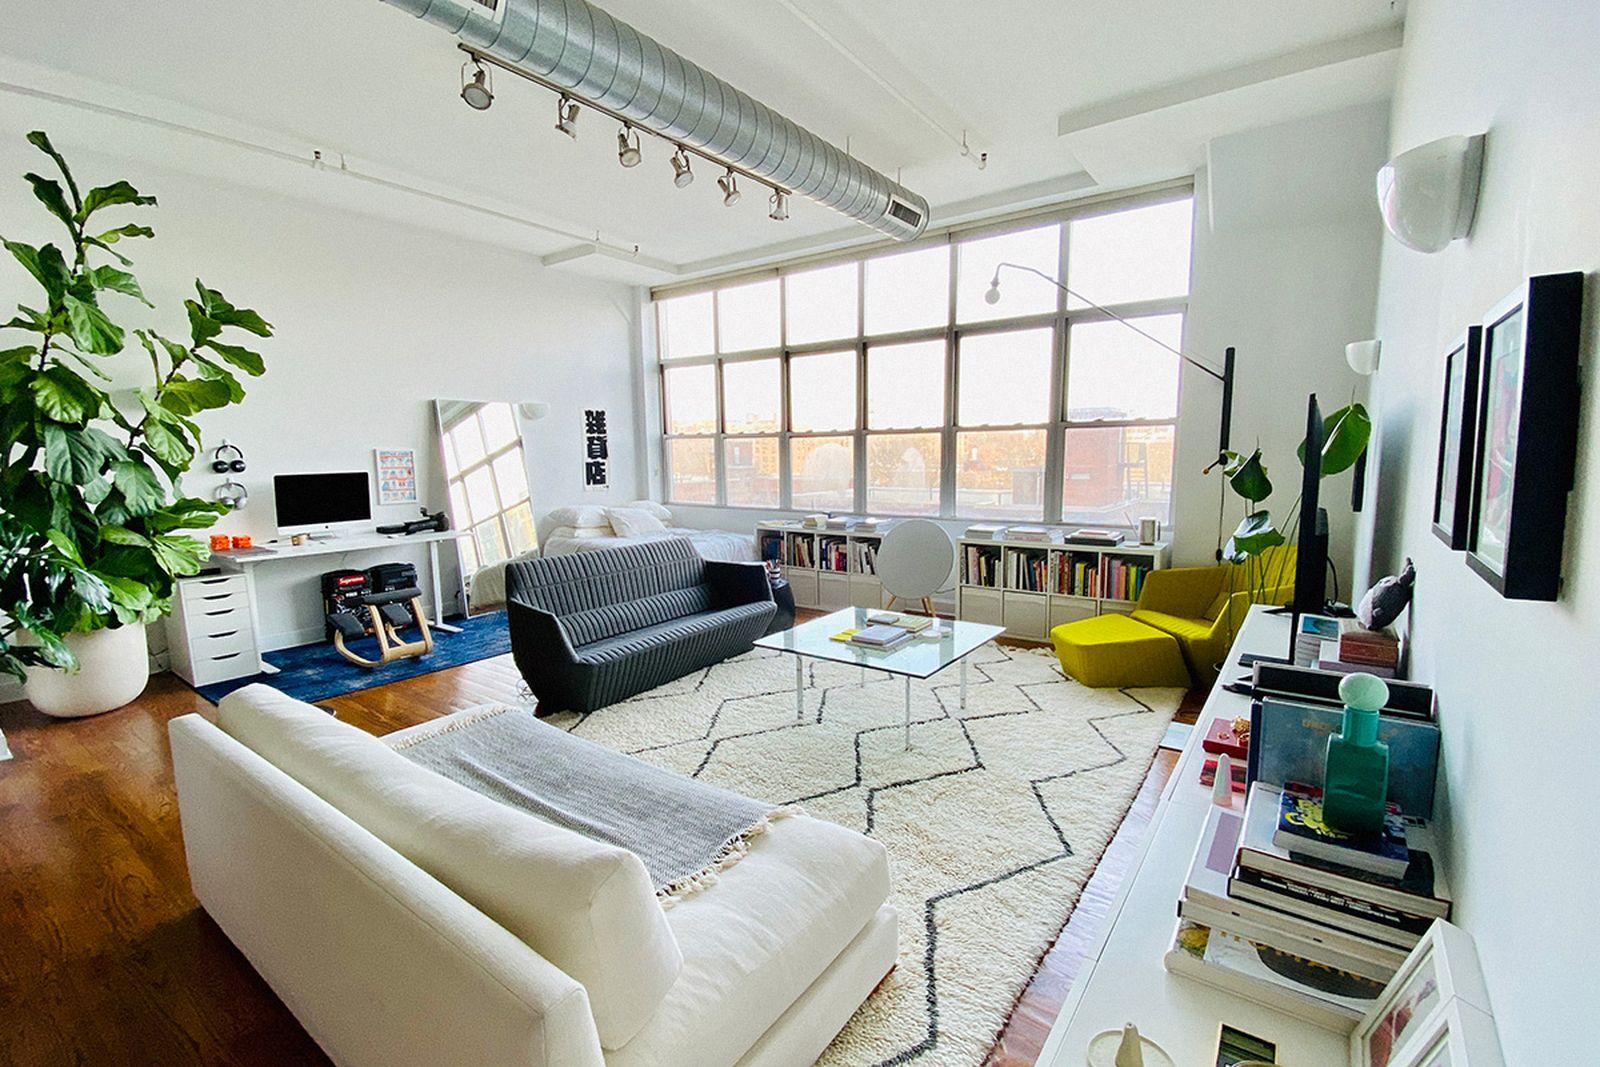 wfh-office-tour-look-inside-home-offices-tyler-joe-main